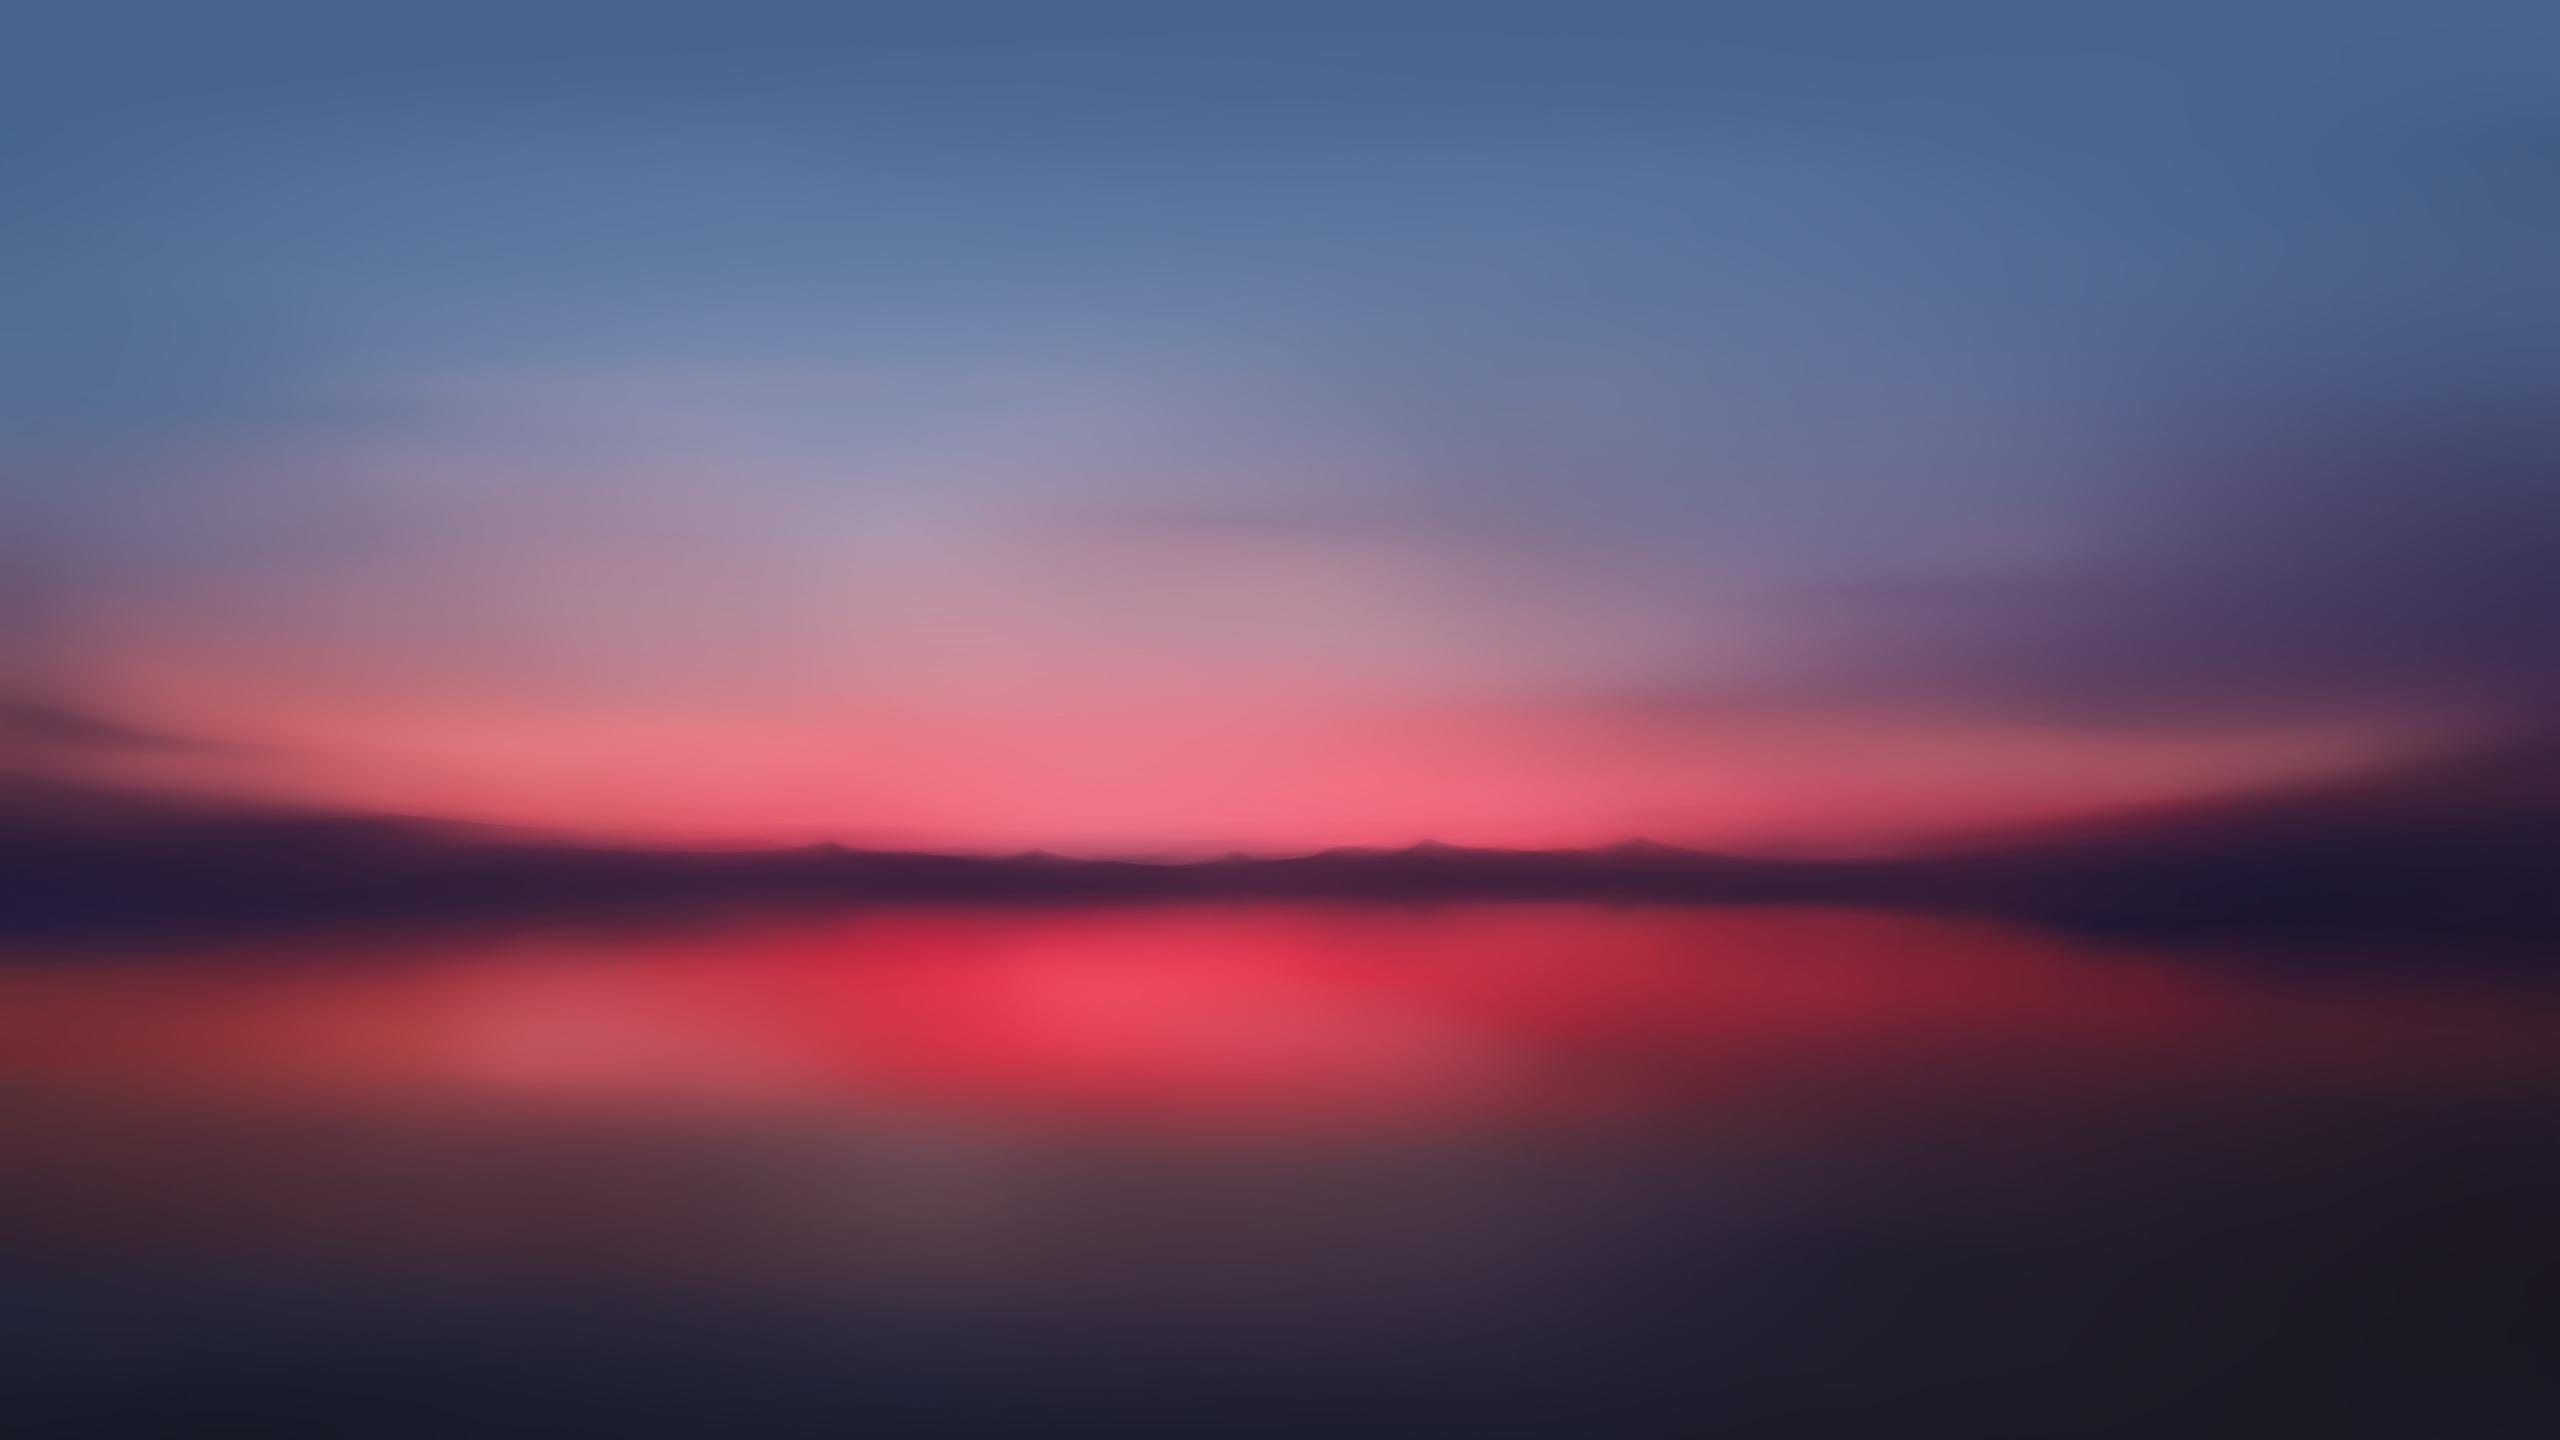 2560x1440 Red Sunset Blur Minimalist 5k 1440P Resolution ...